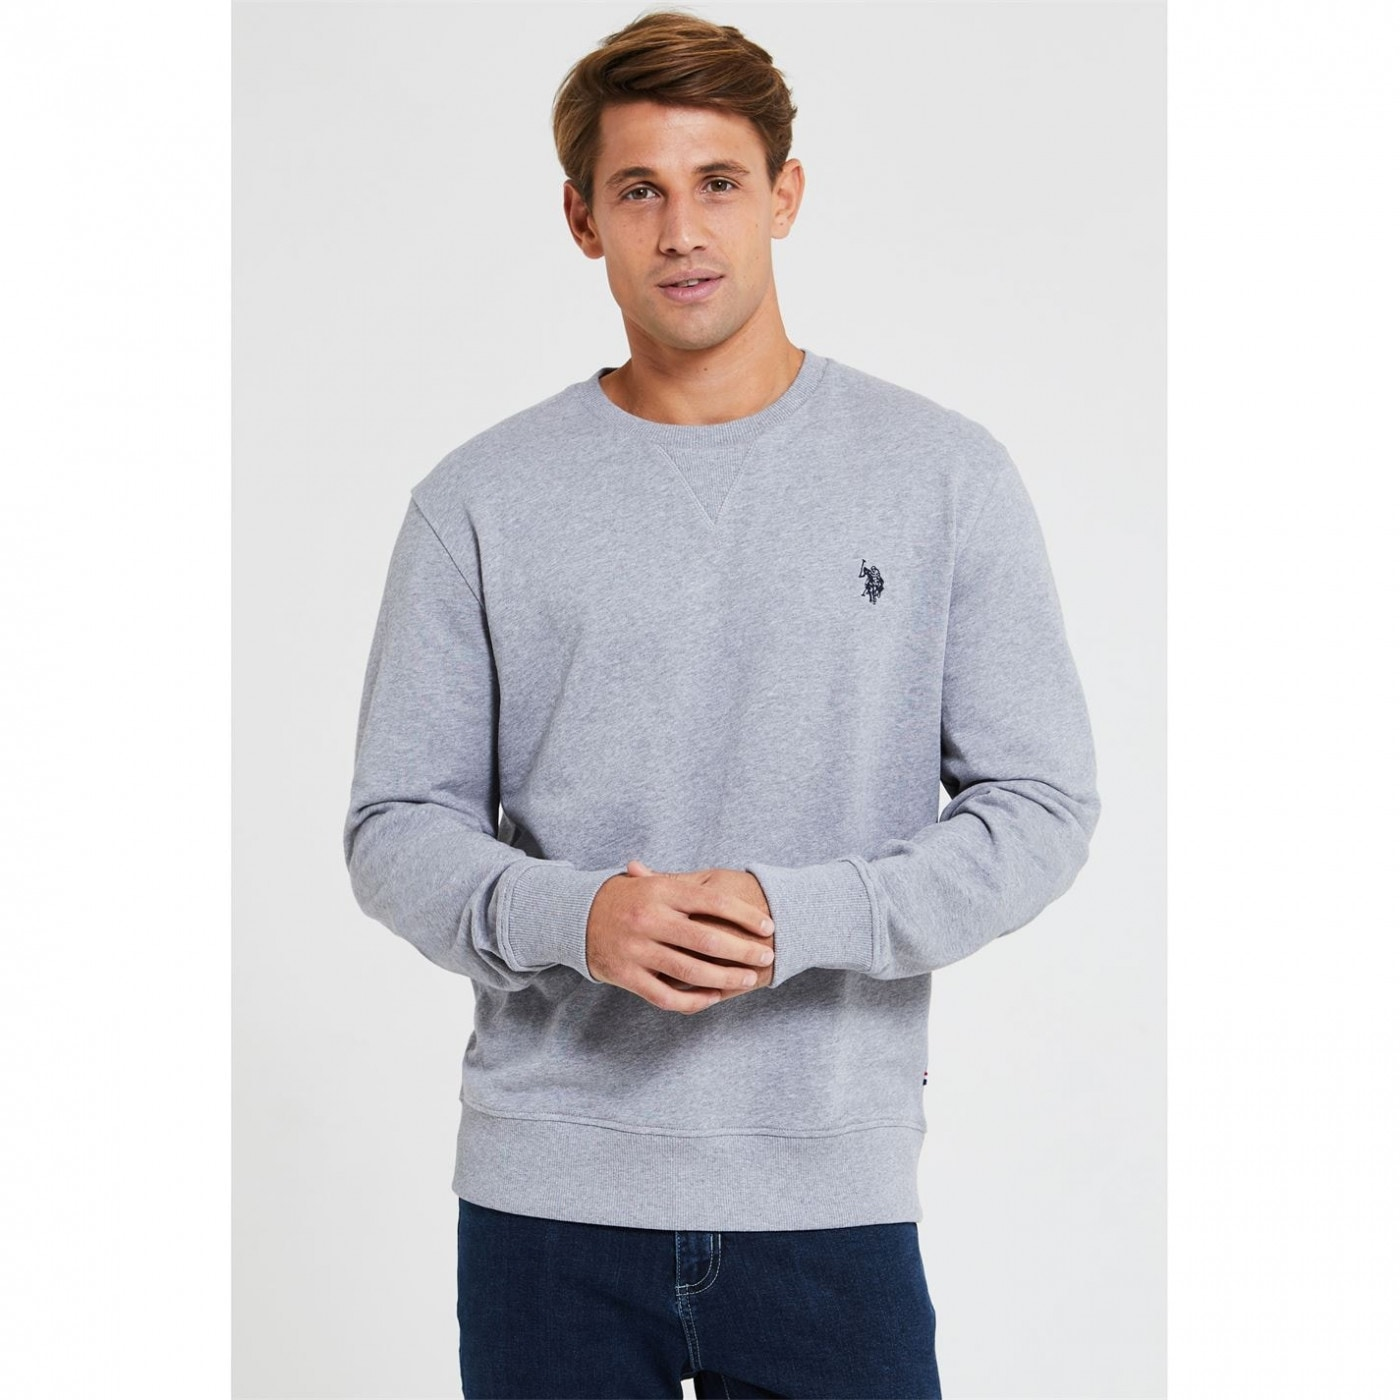 US Polo Assn Core Crew Sweatshirt